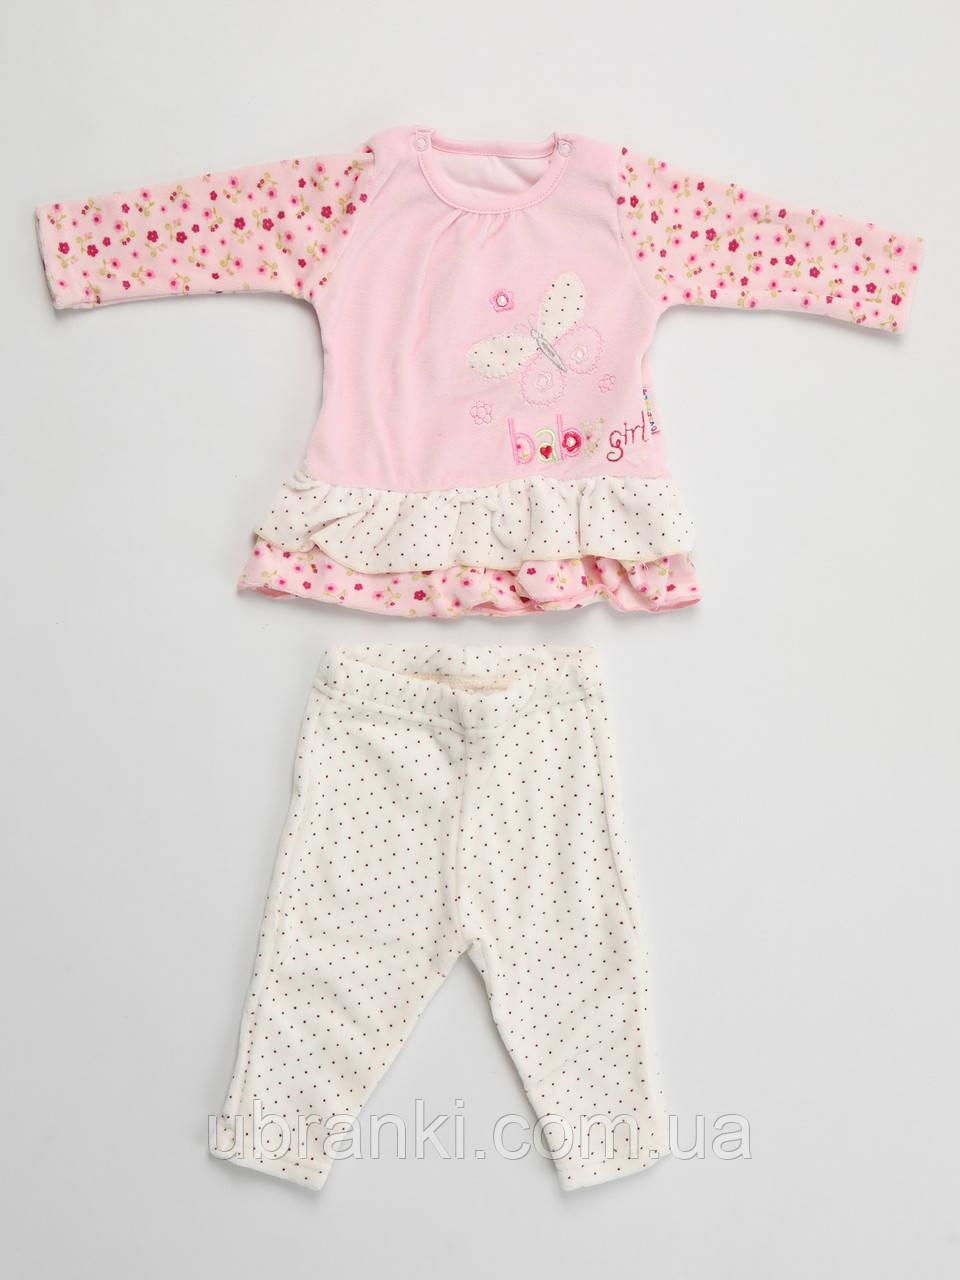 Комплект (платье, штанишки)